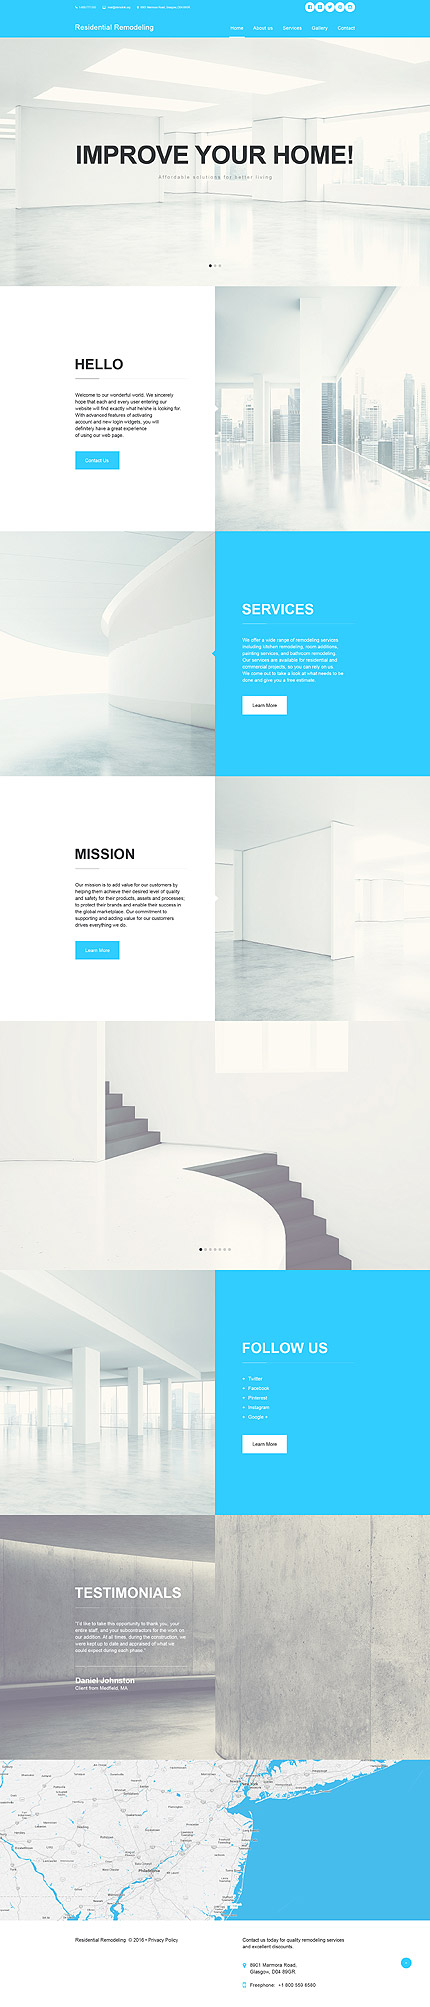 Muse шаблон сайта о дизайне интерьеров